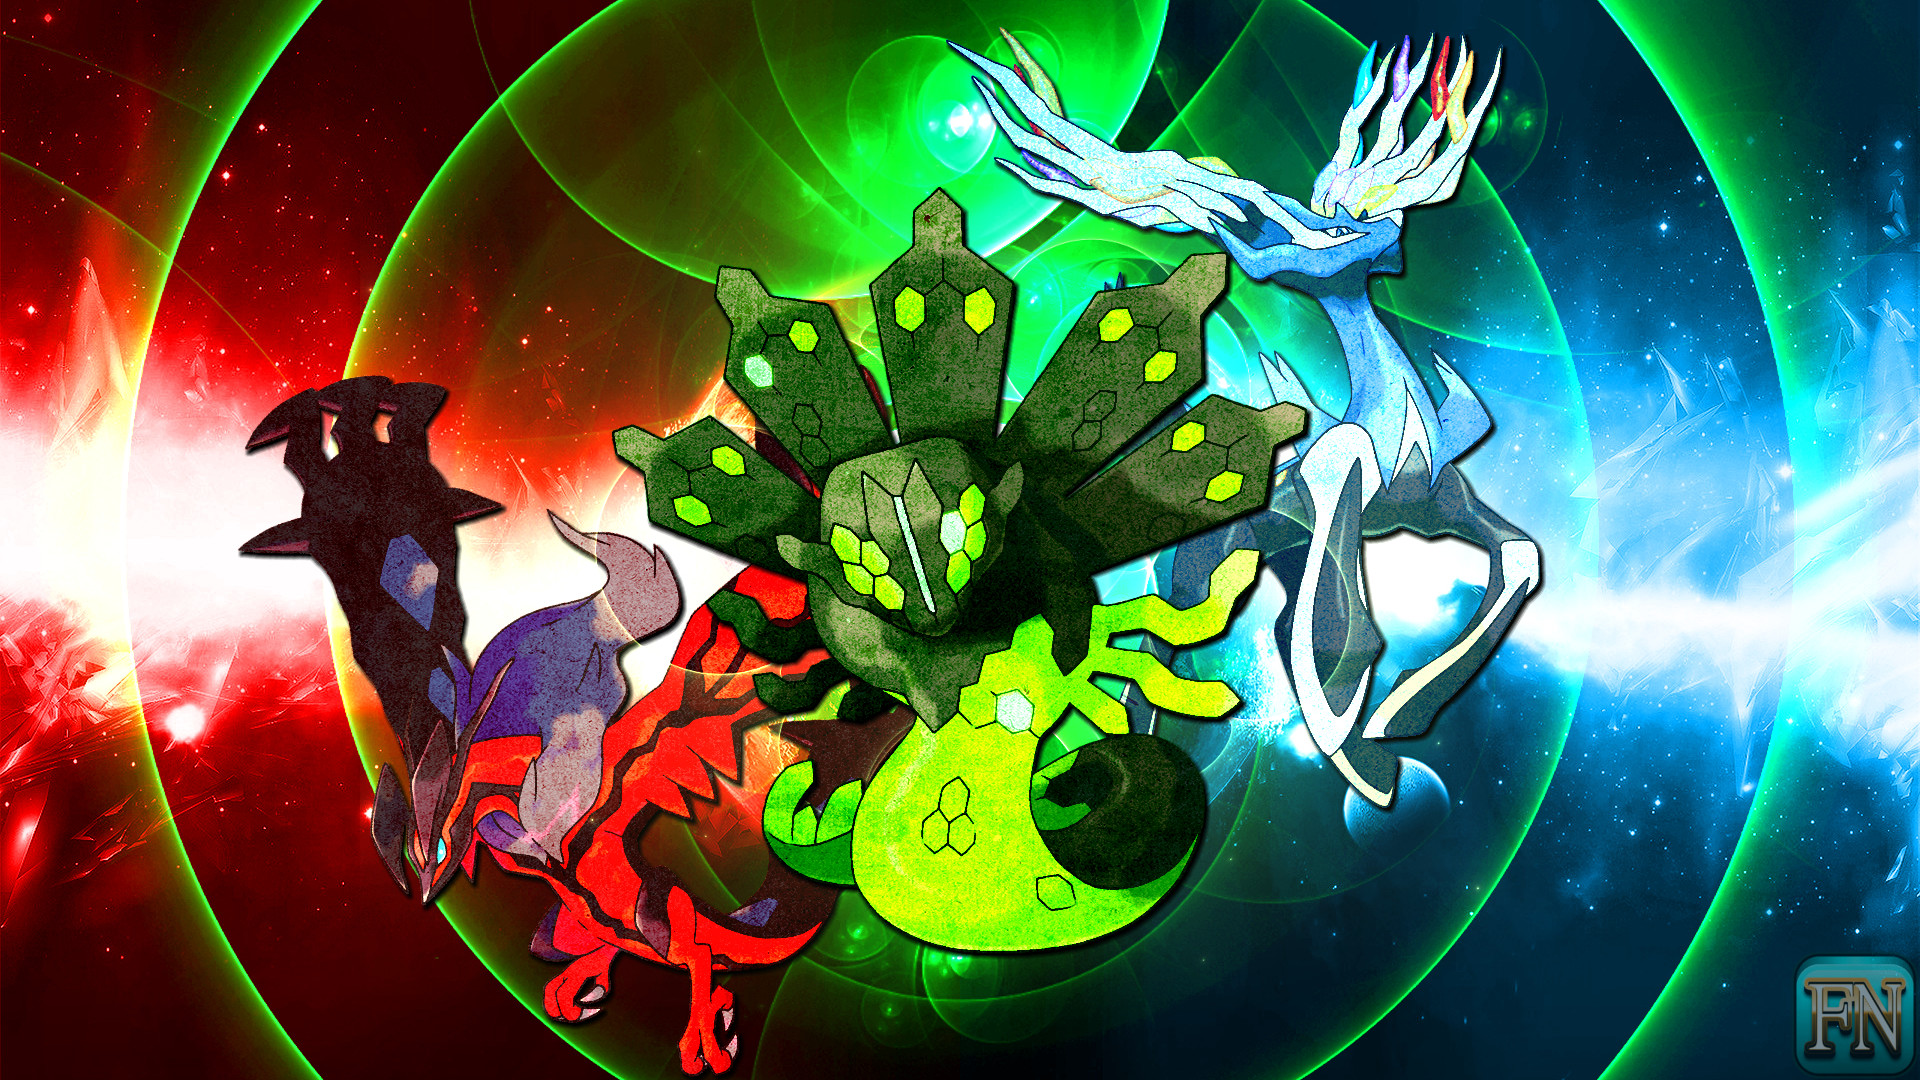 … Pokemon Wallpaper: Xerneas Yveltal and Zygarde by FRUITYNITE